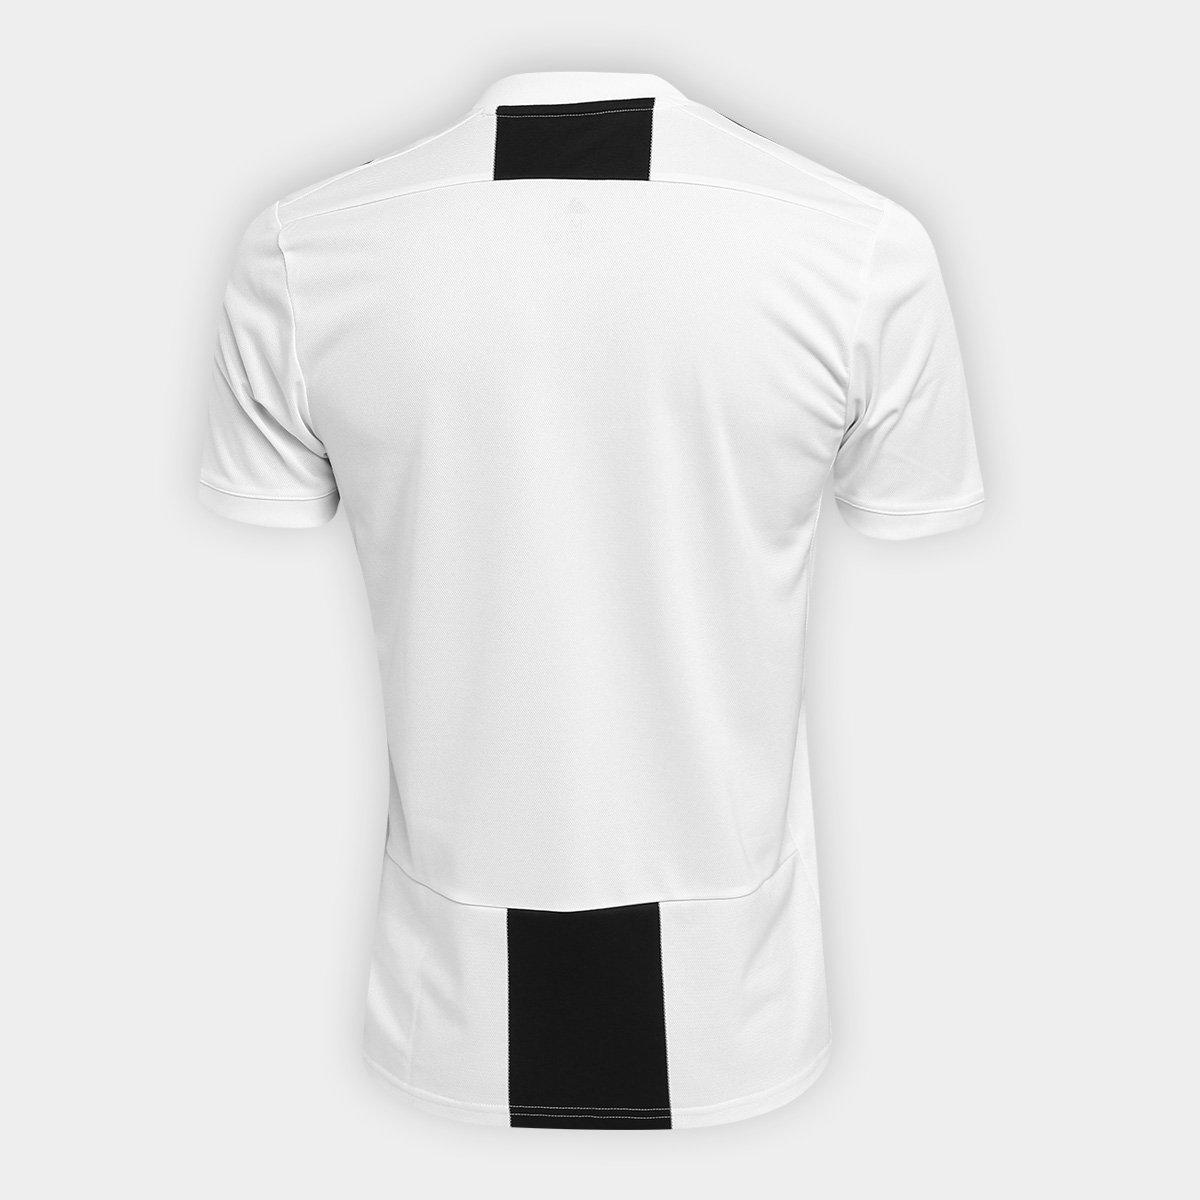 camisa juventus home 2018 s n torcedor adidas masculina netshoes camisa juventus home 2018 s n torcedor adidas masculina